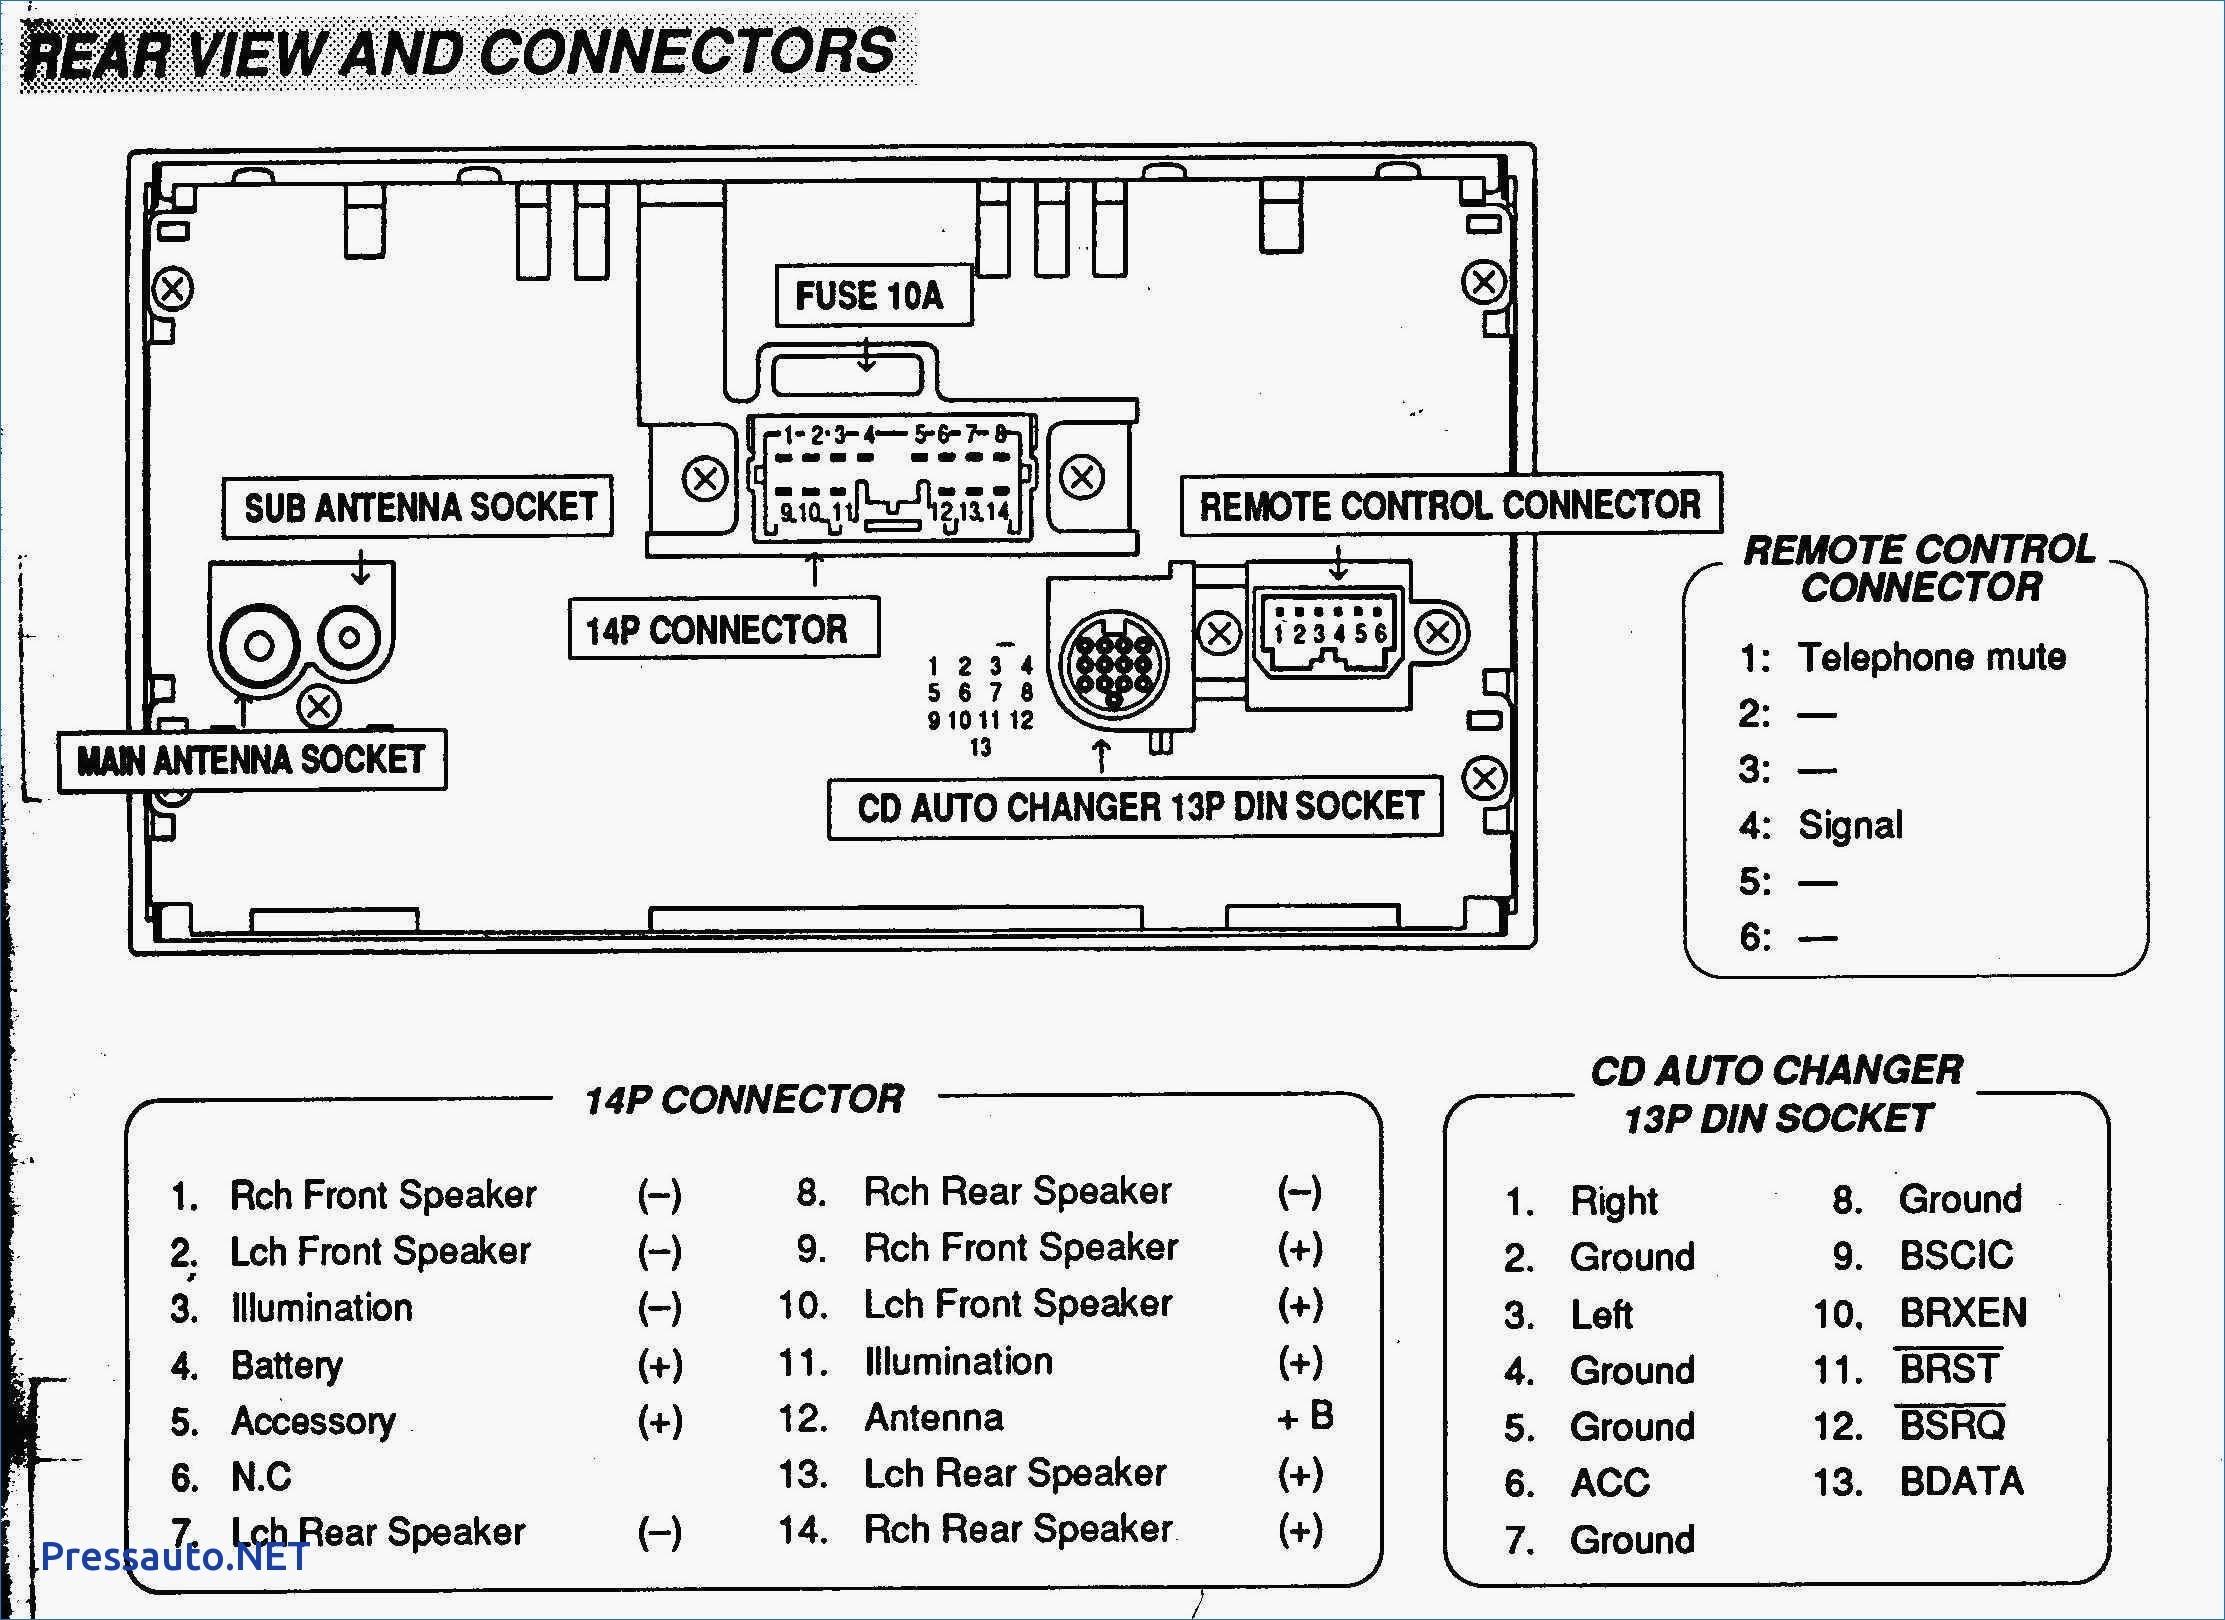 2000 Vw Jetta Radio Wiring Diagram Golf 4 Radio Wiring Diagram Fresh 2002 Jetta Radio Wiring Diagram Of 2000 Vw Jetta Radio Wiring Diagram